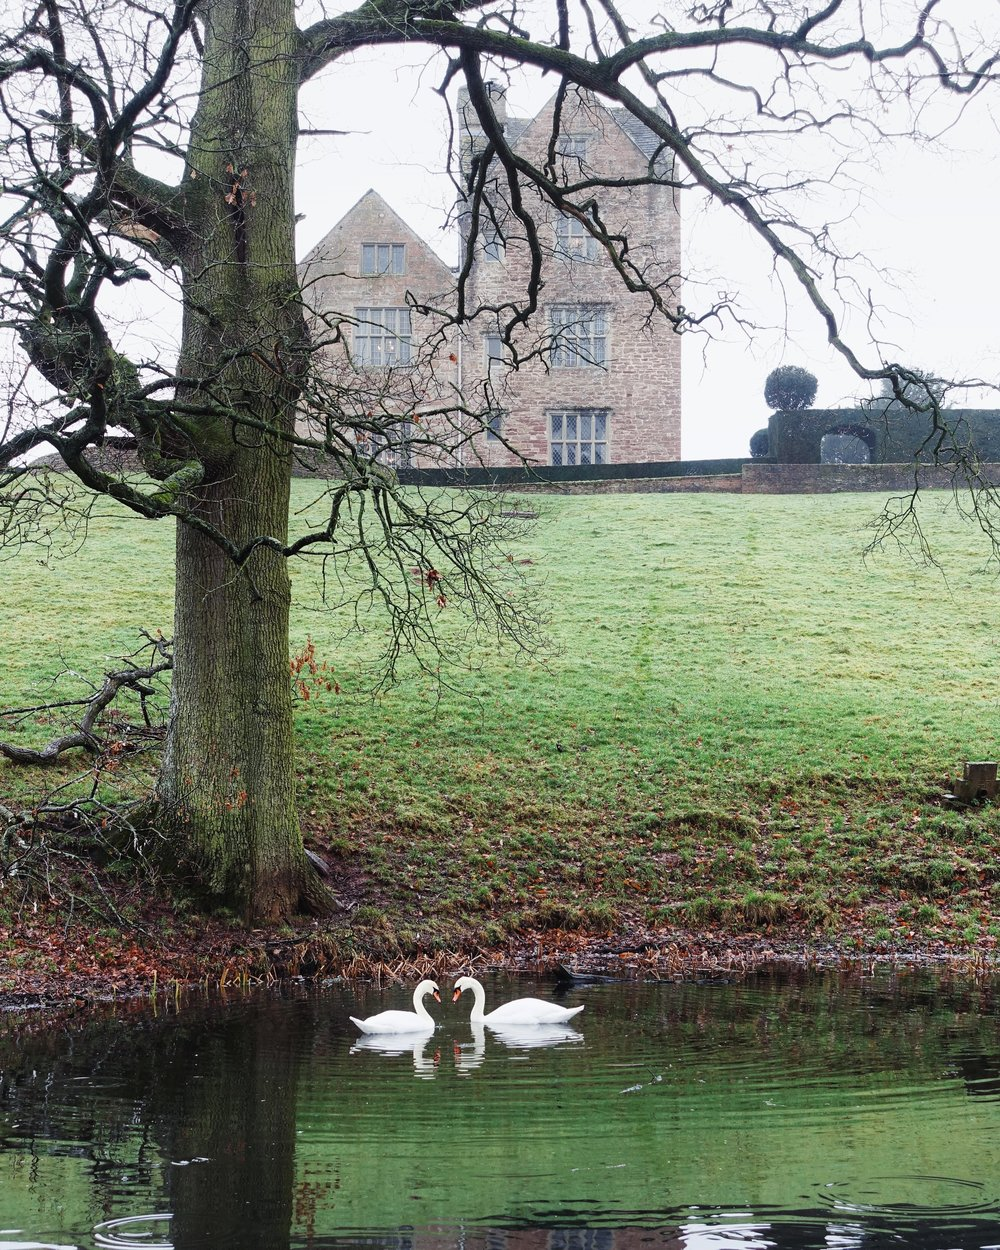 Another week in Treowen Manor